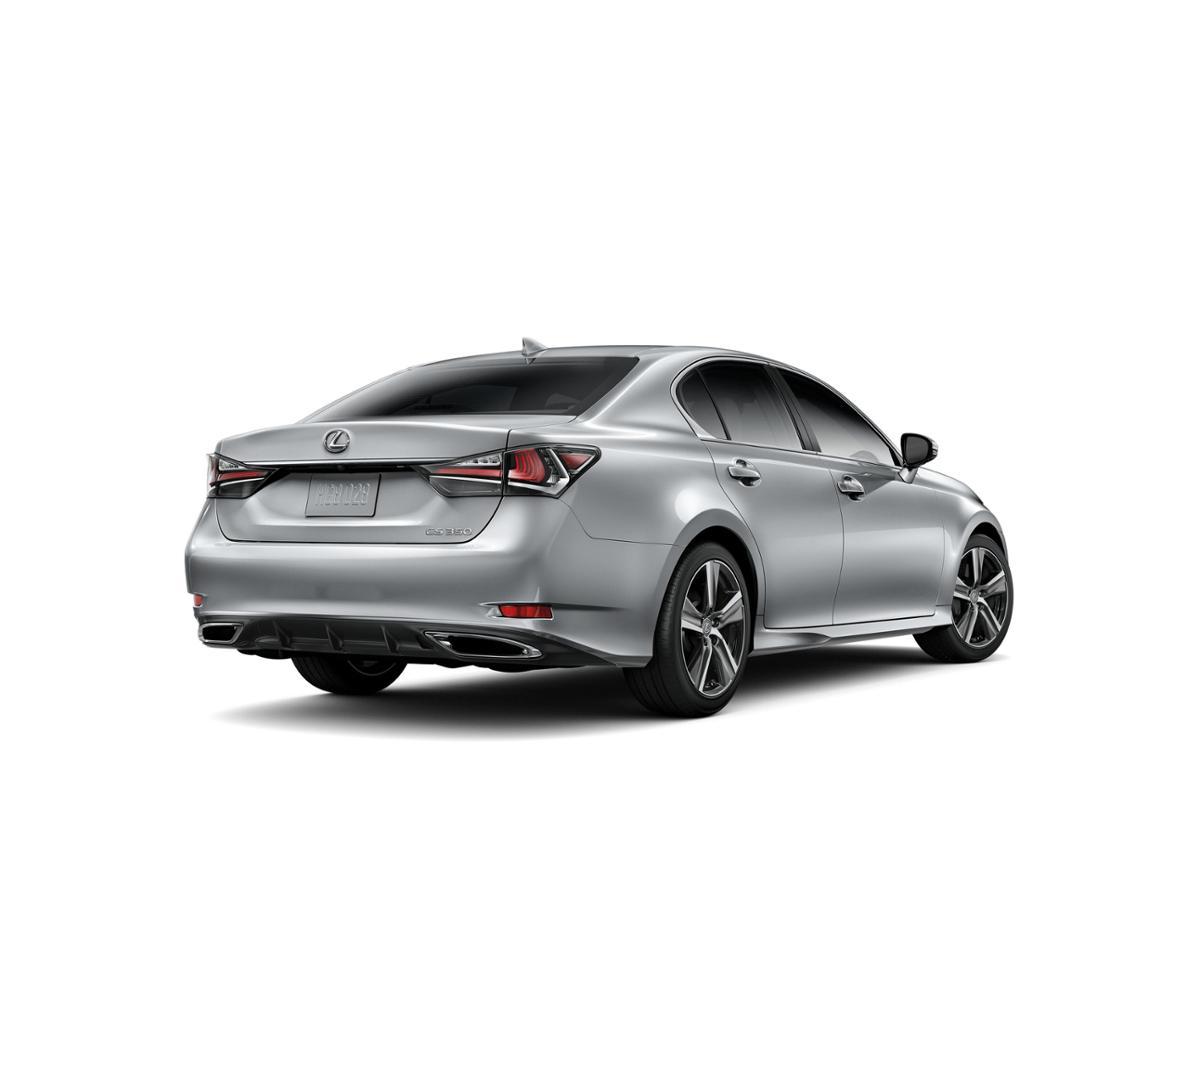 Lexus Gs Lease: Dallas New 2019 Lexus GS 350 Liquid Platinum: Car For Sale